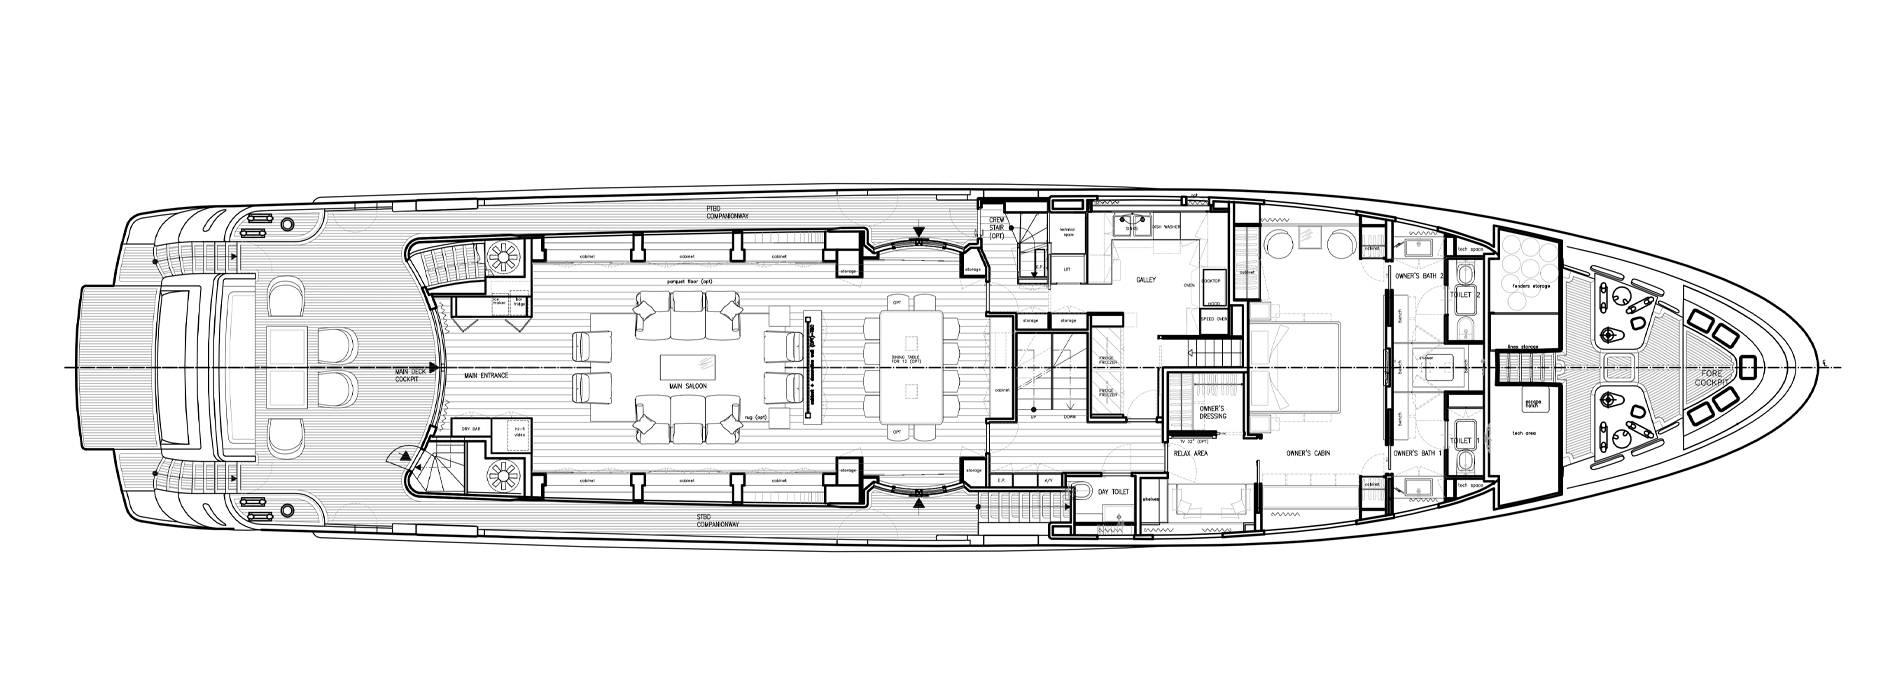 Sanlorenzo Yachts SD122-27 under offer Главная палуба